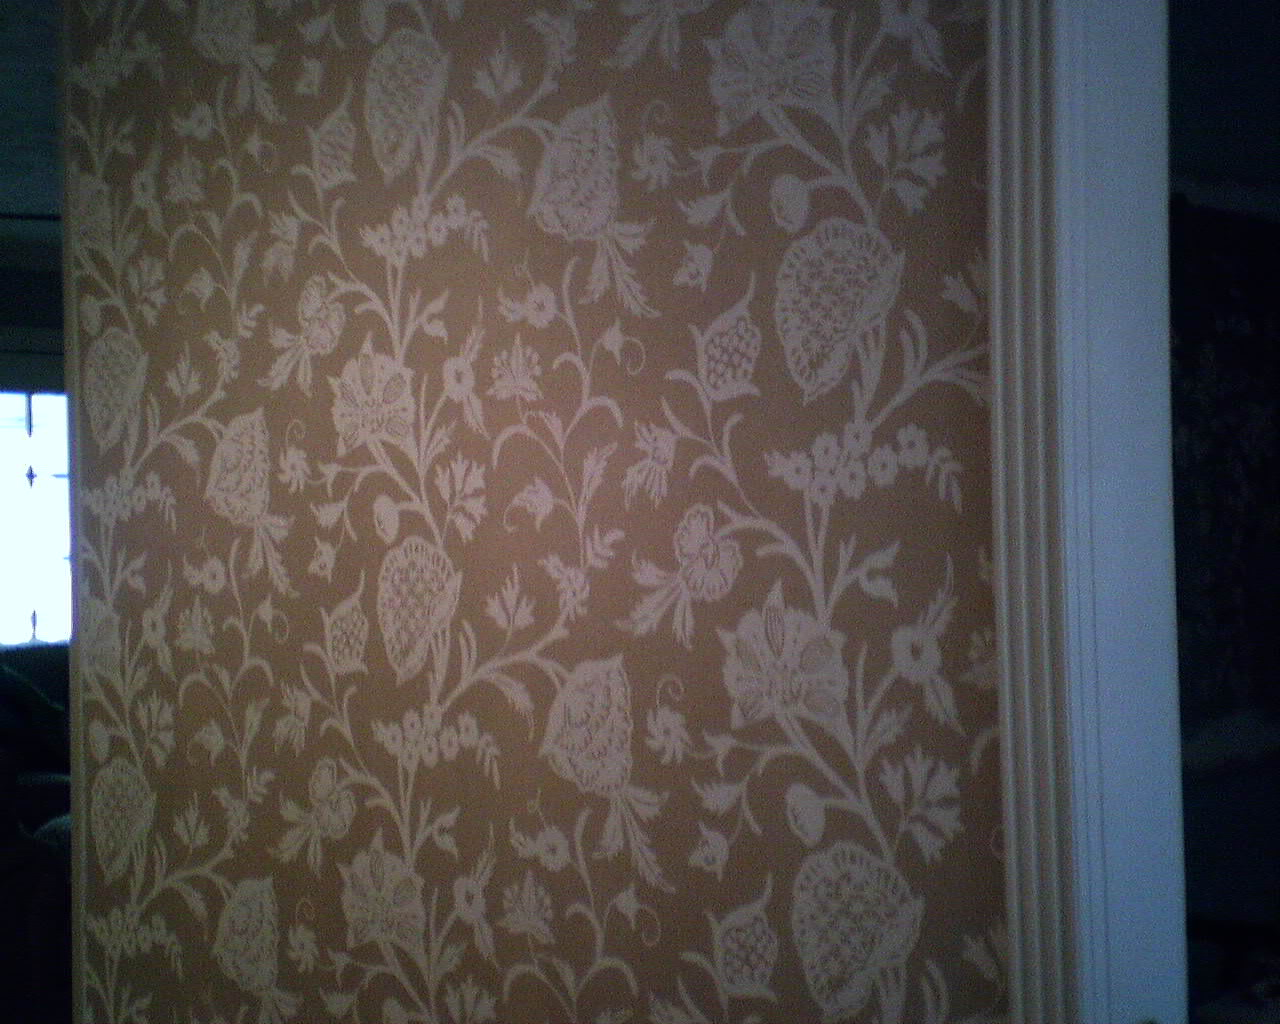 Most Inspiring Wallpaper Home Screen Marble - dsc00081  Best Photo Reference_983911.jpg